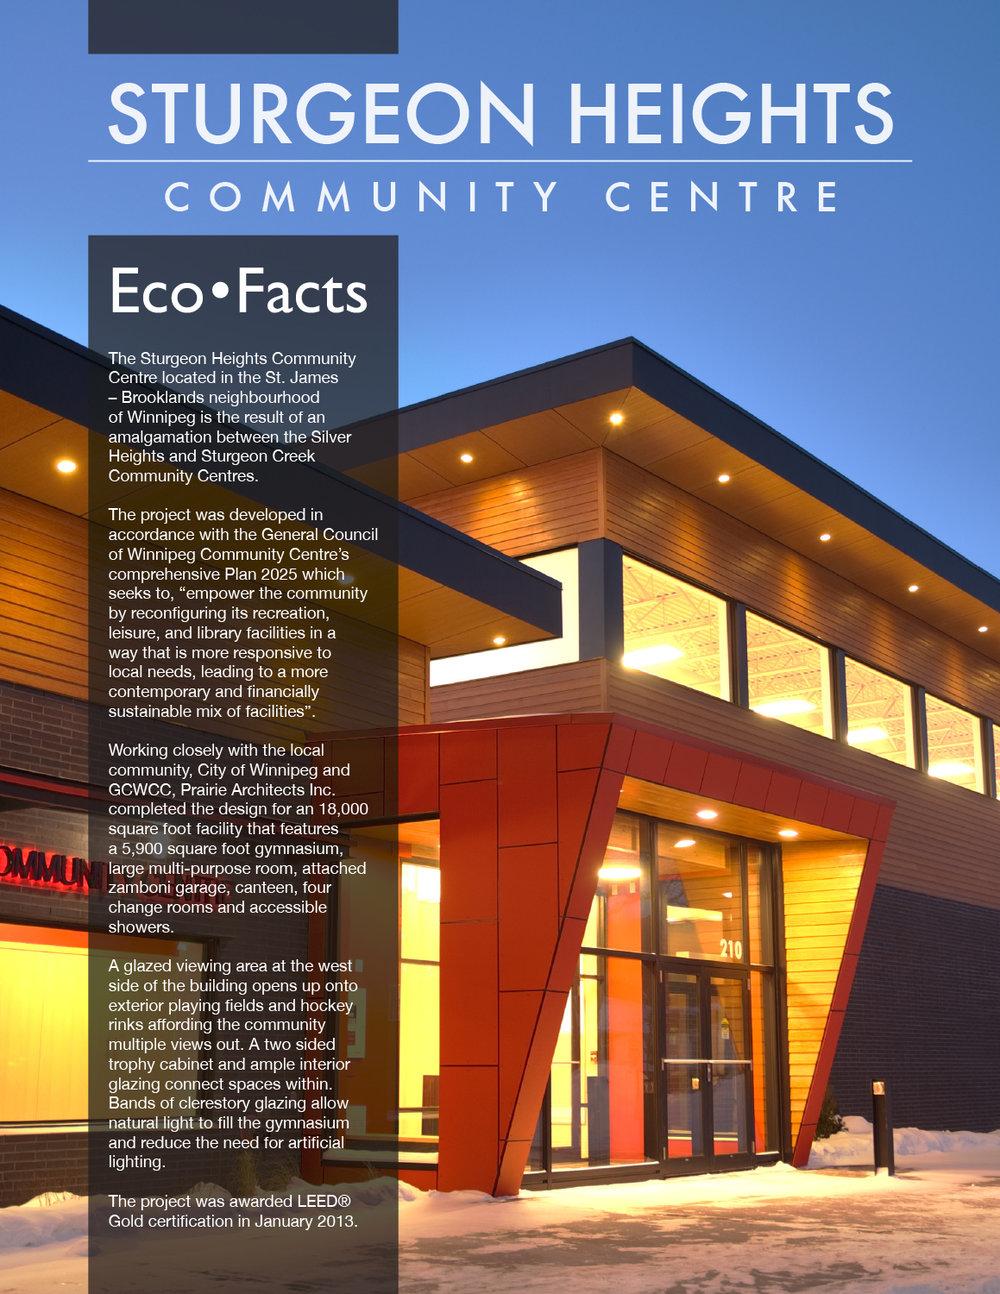 SHCC Eco Facts.jpg